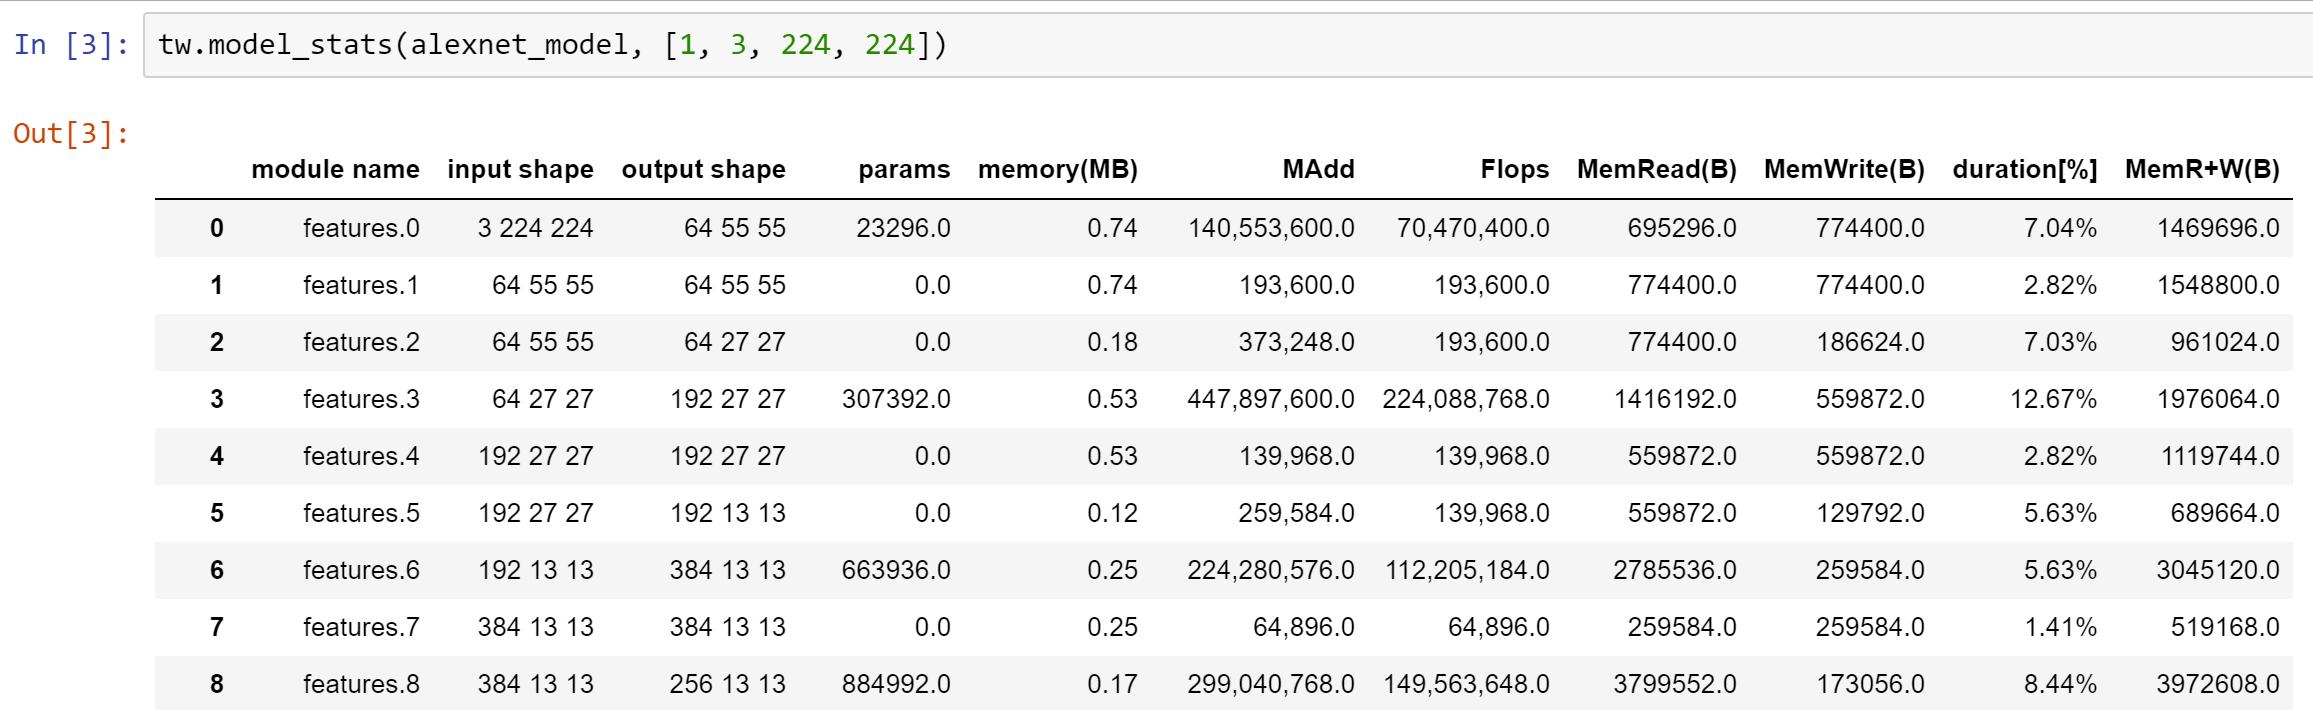 Model statistics for Alexnet